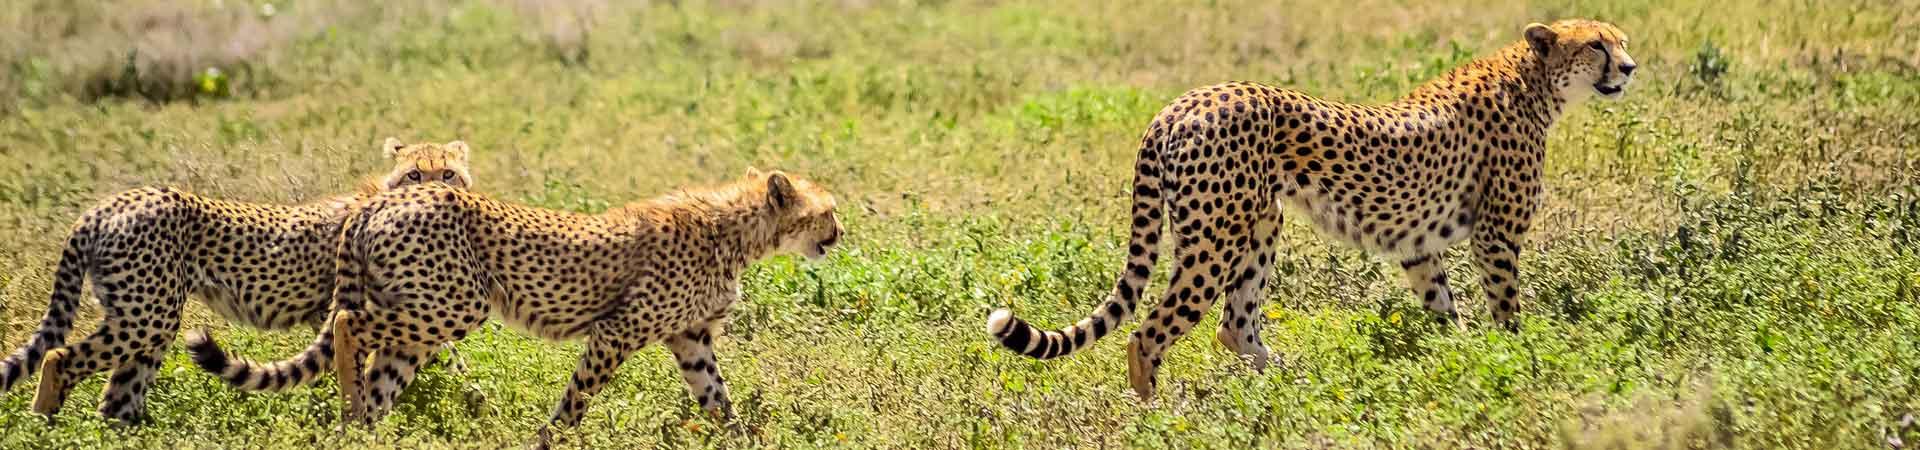 Cheetah-Serengeti National Park